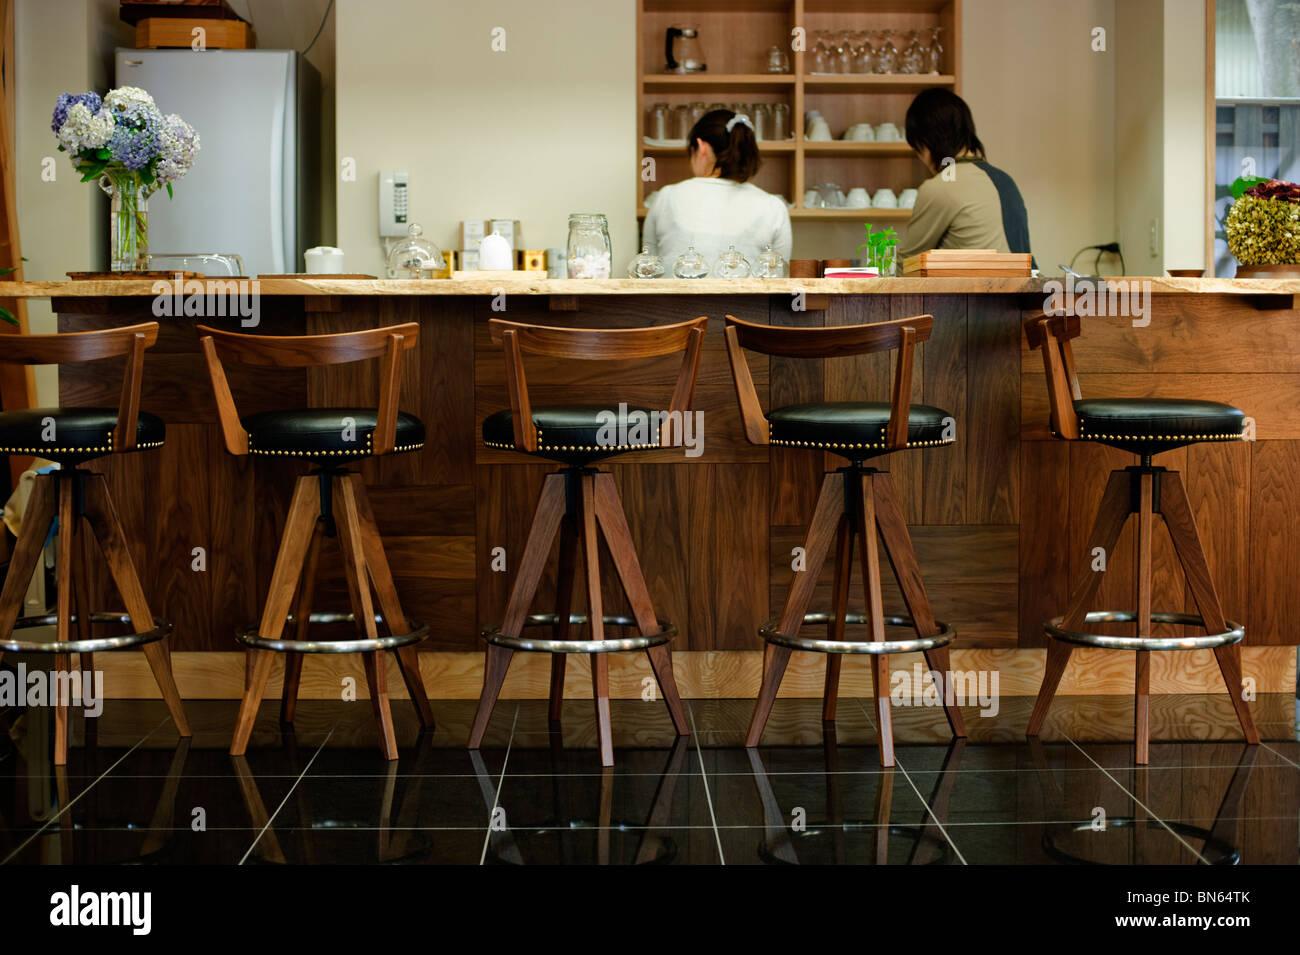 Tabourets De Bar Au Café à La George Nakashima Gallery à Takamatsu